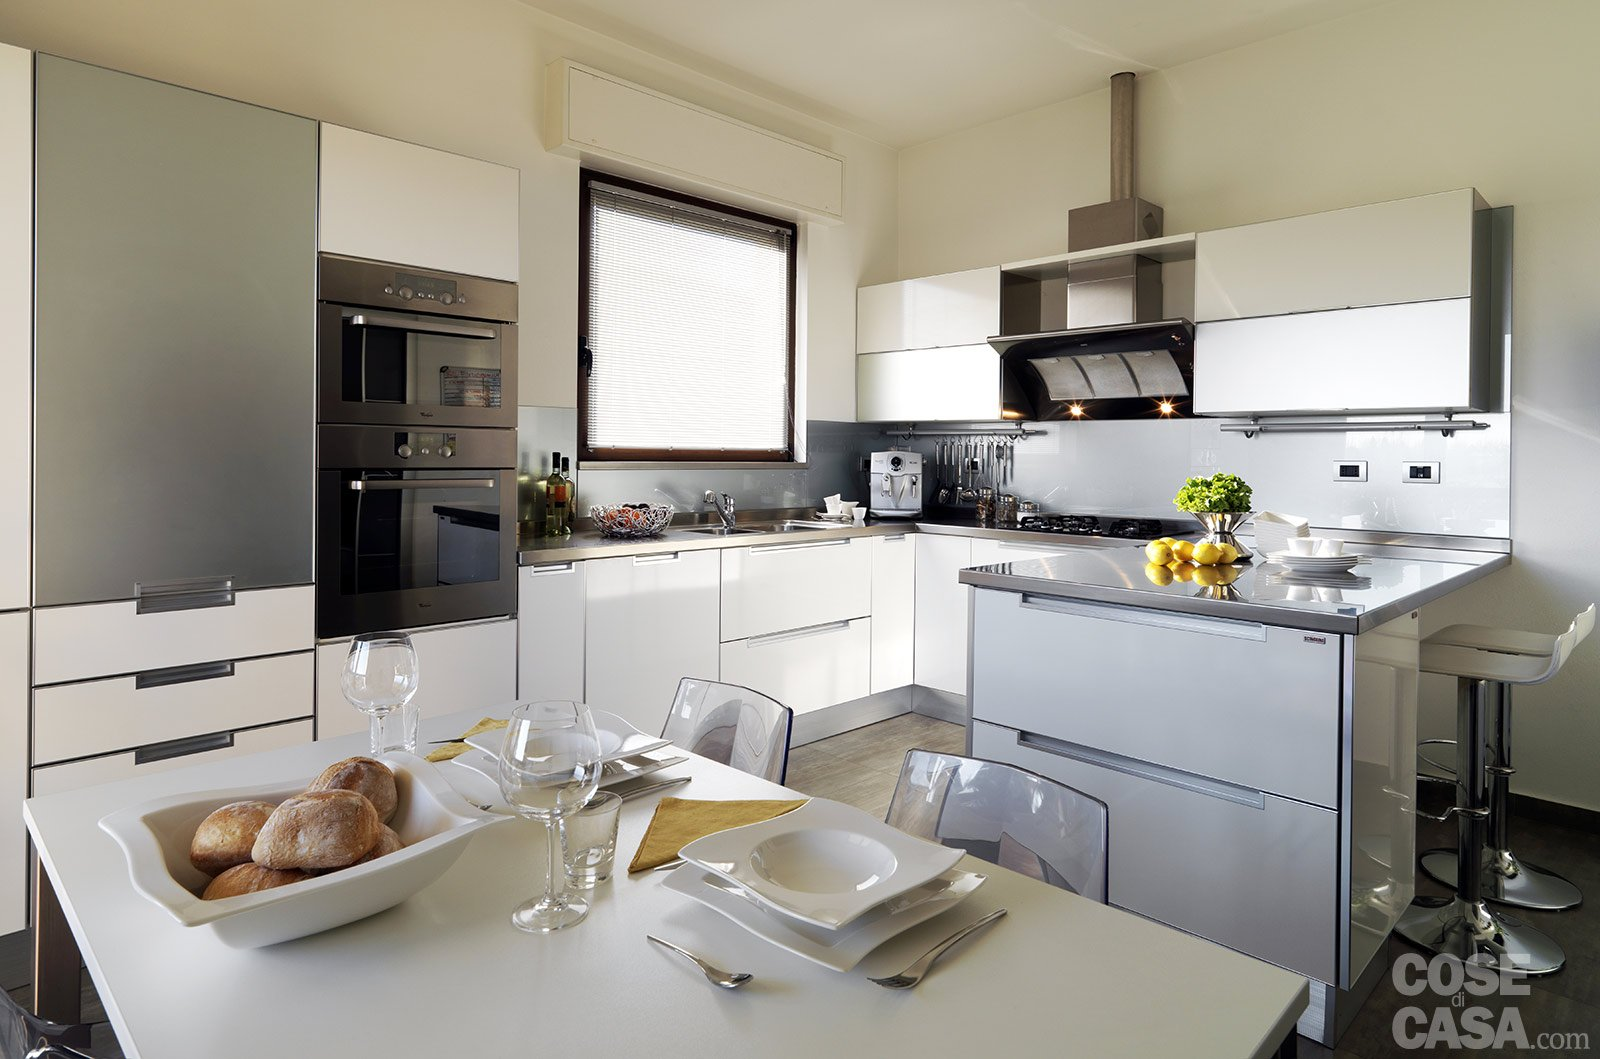 Parete Cucina Con Finestra: Vetreria goethe tags rivestimento parete cucina.